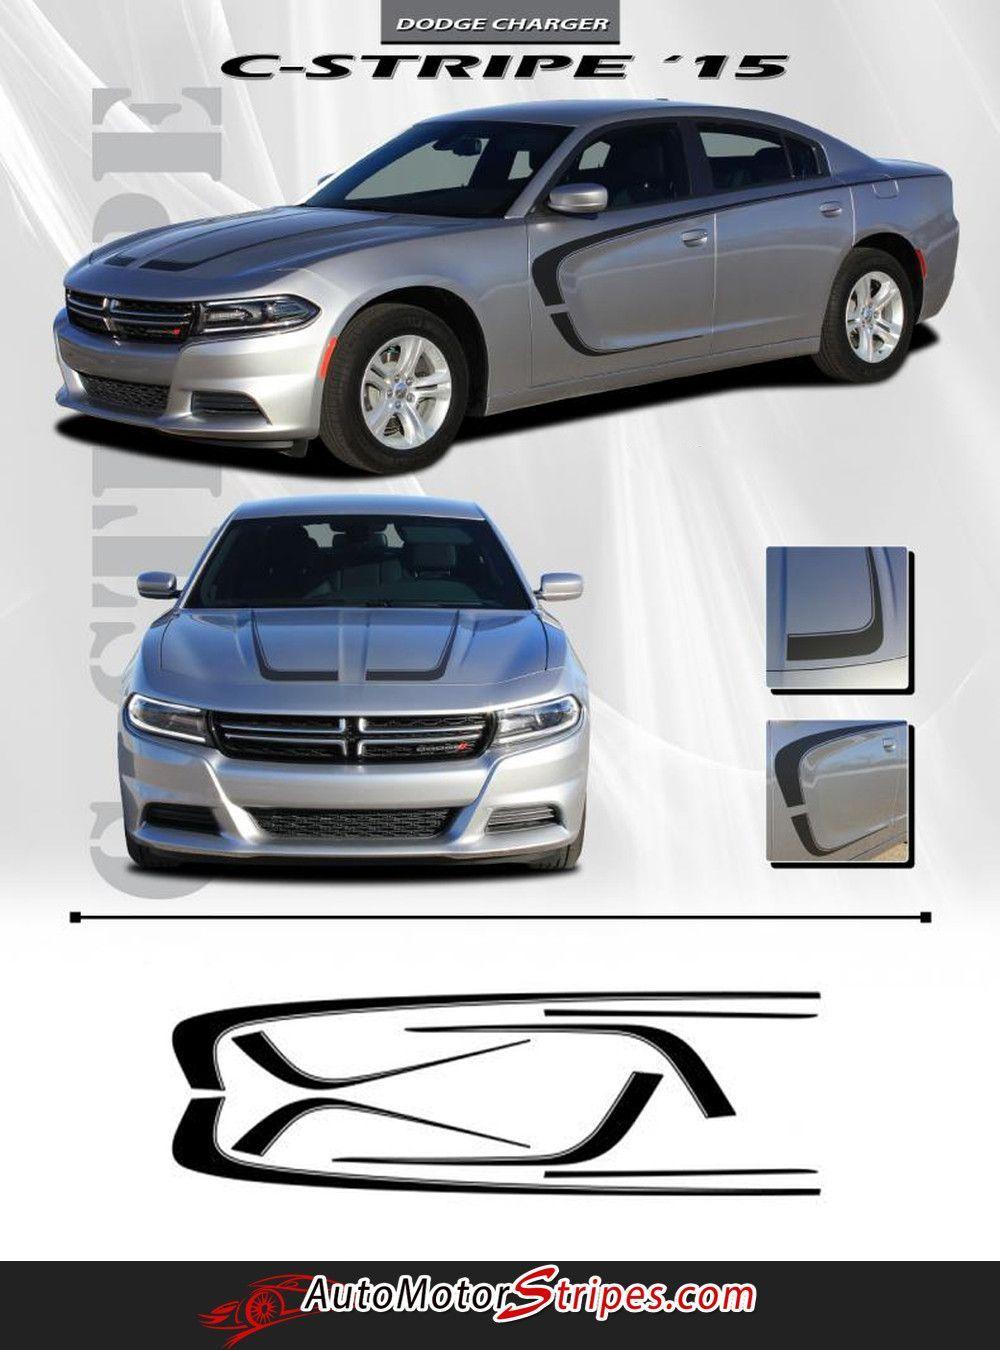 2015 2016 dodge charger c stripe combo hood and door sides mopar style vinyl